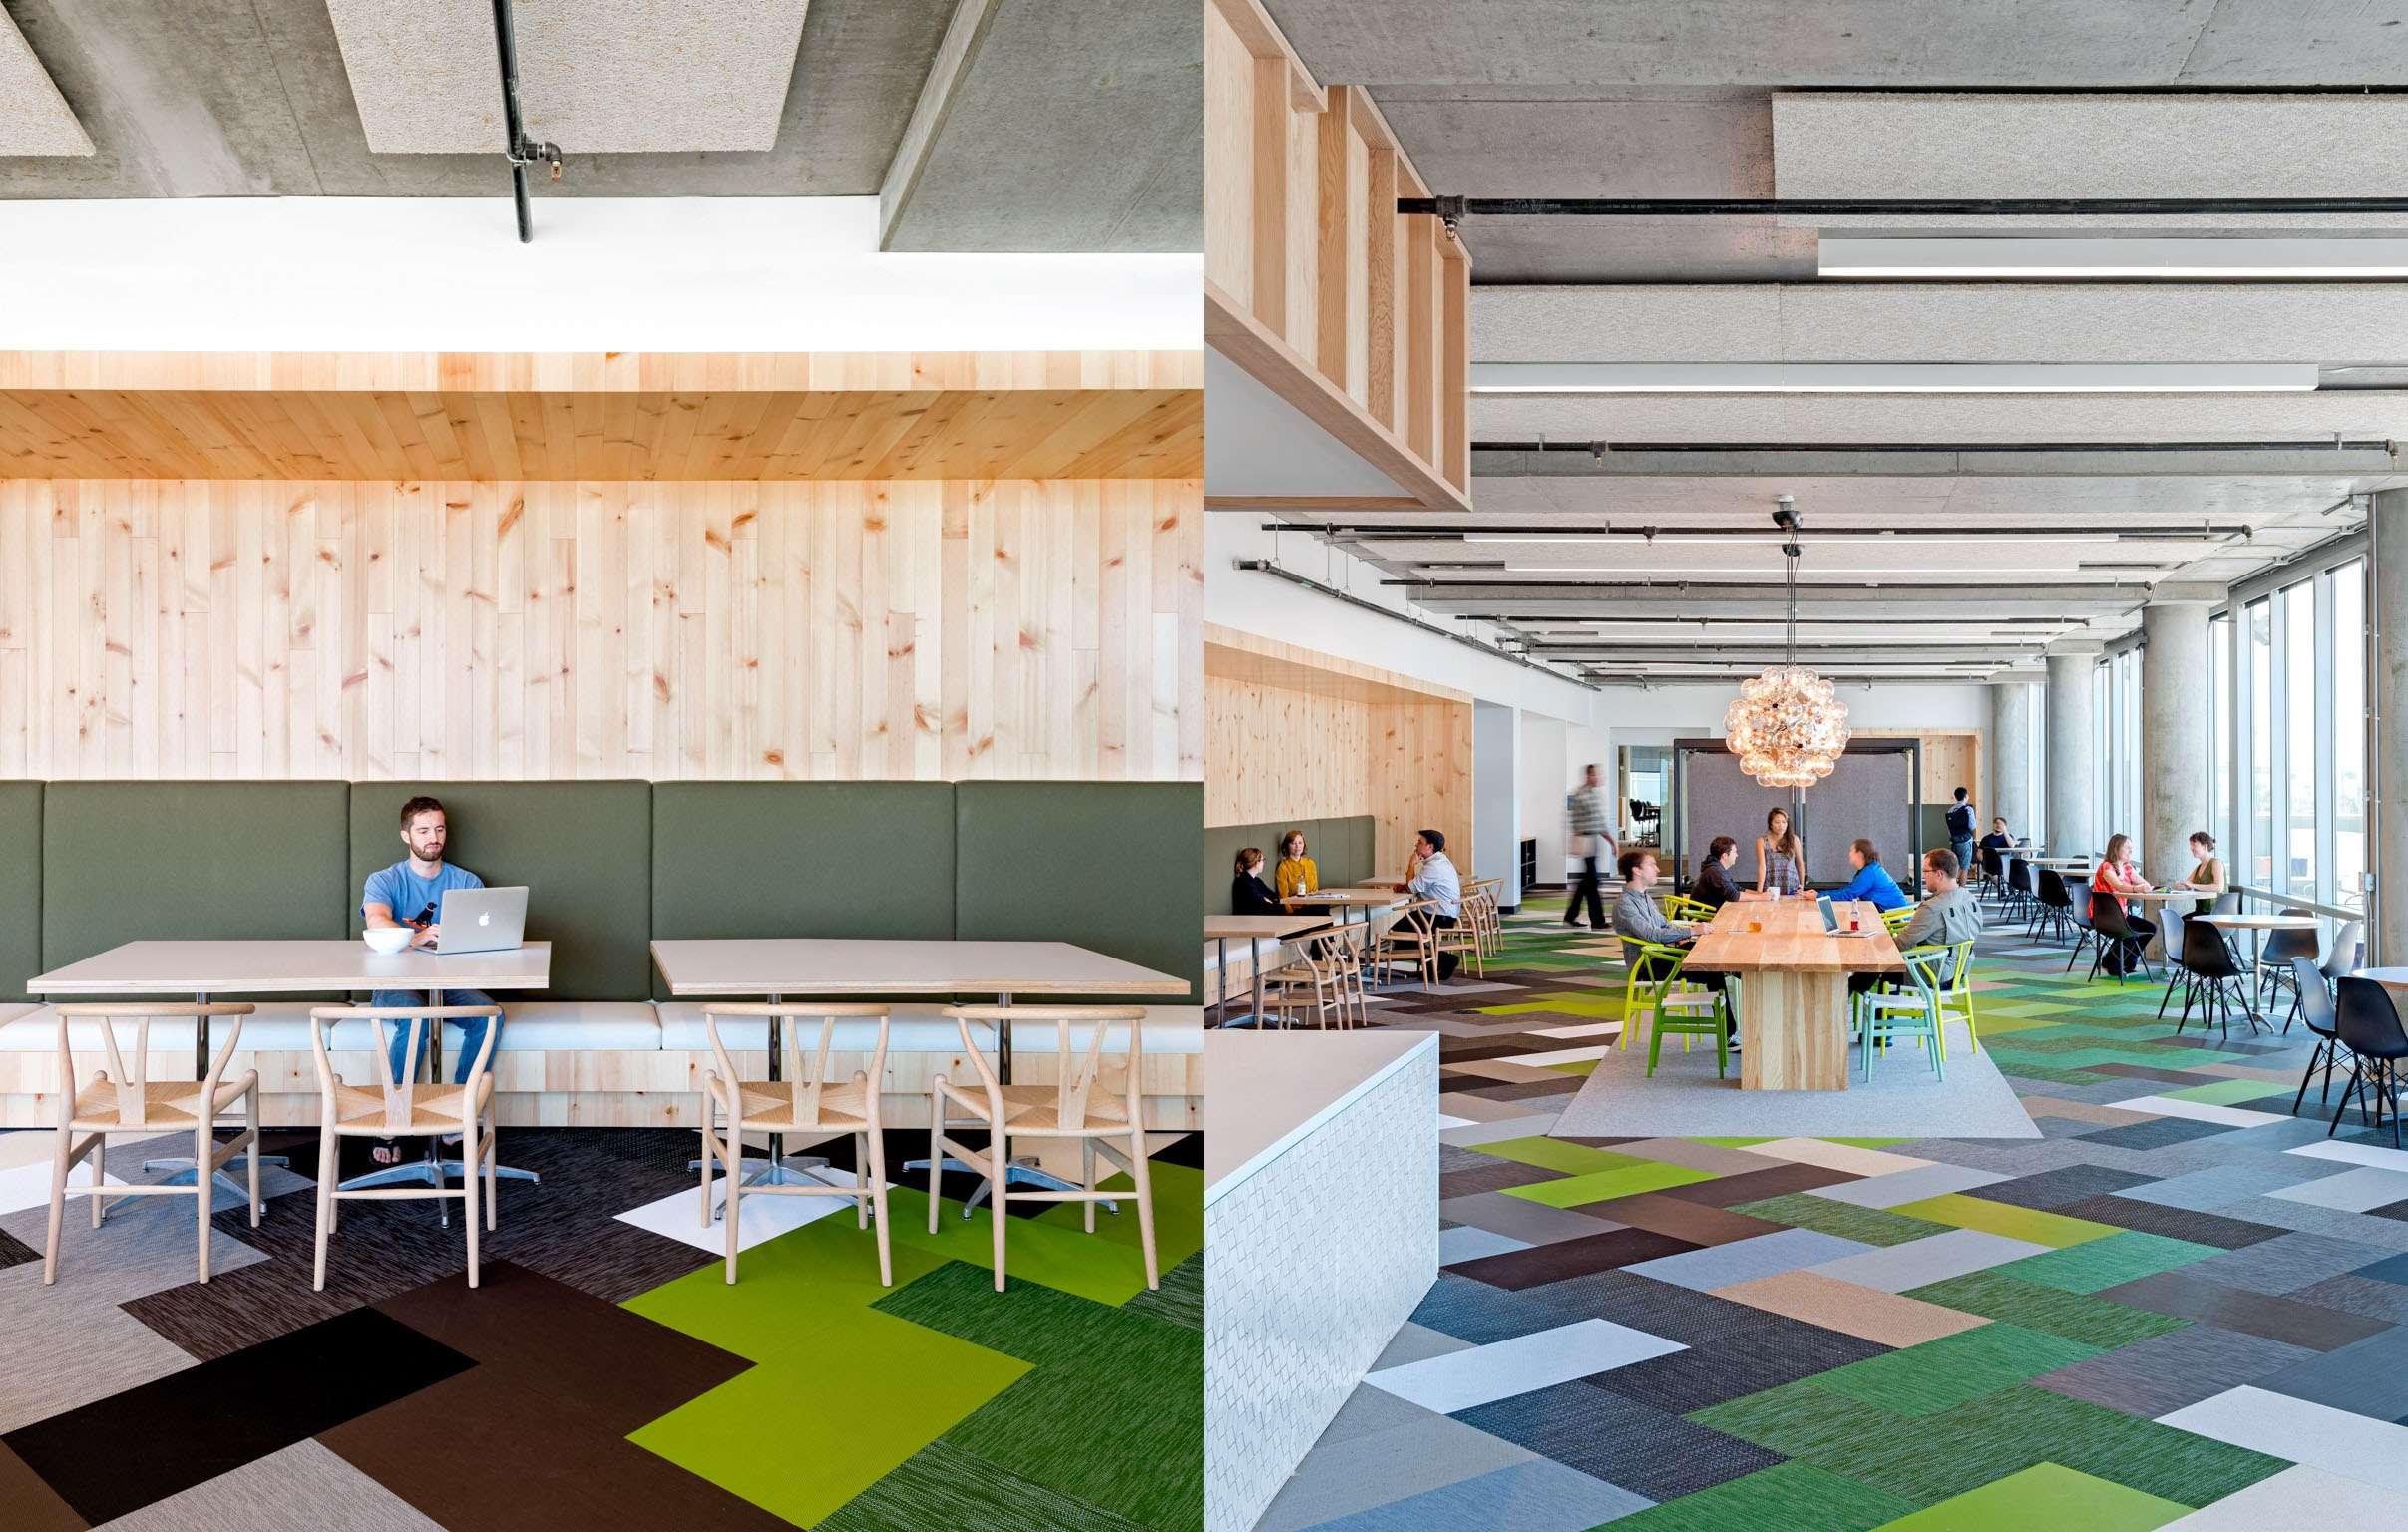 Bolon floor tiles in the office of Cisco Meraki in San Francisco, USA